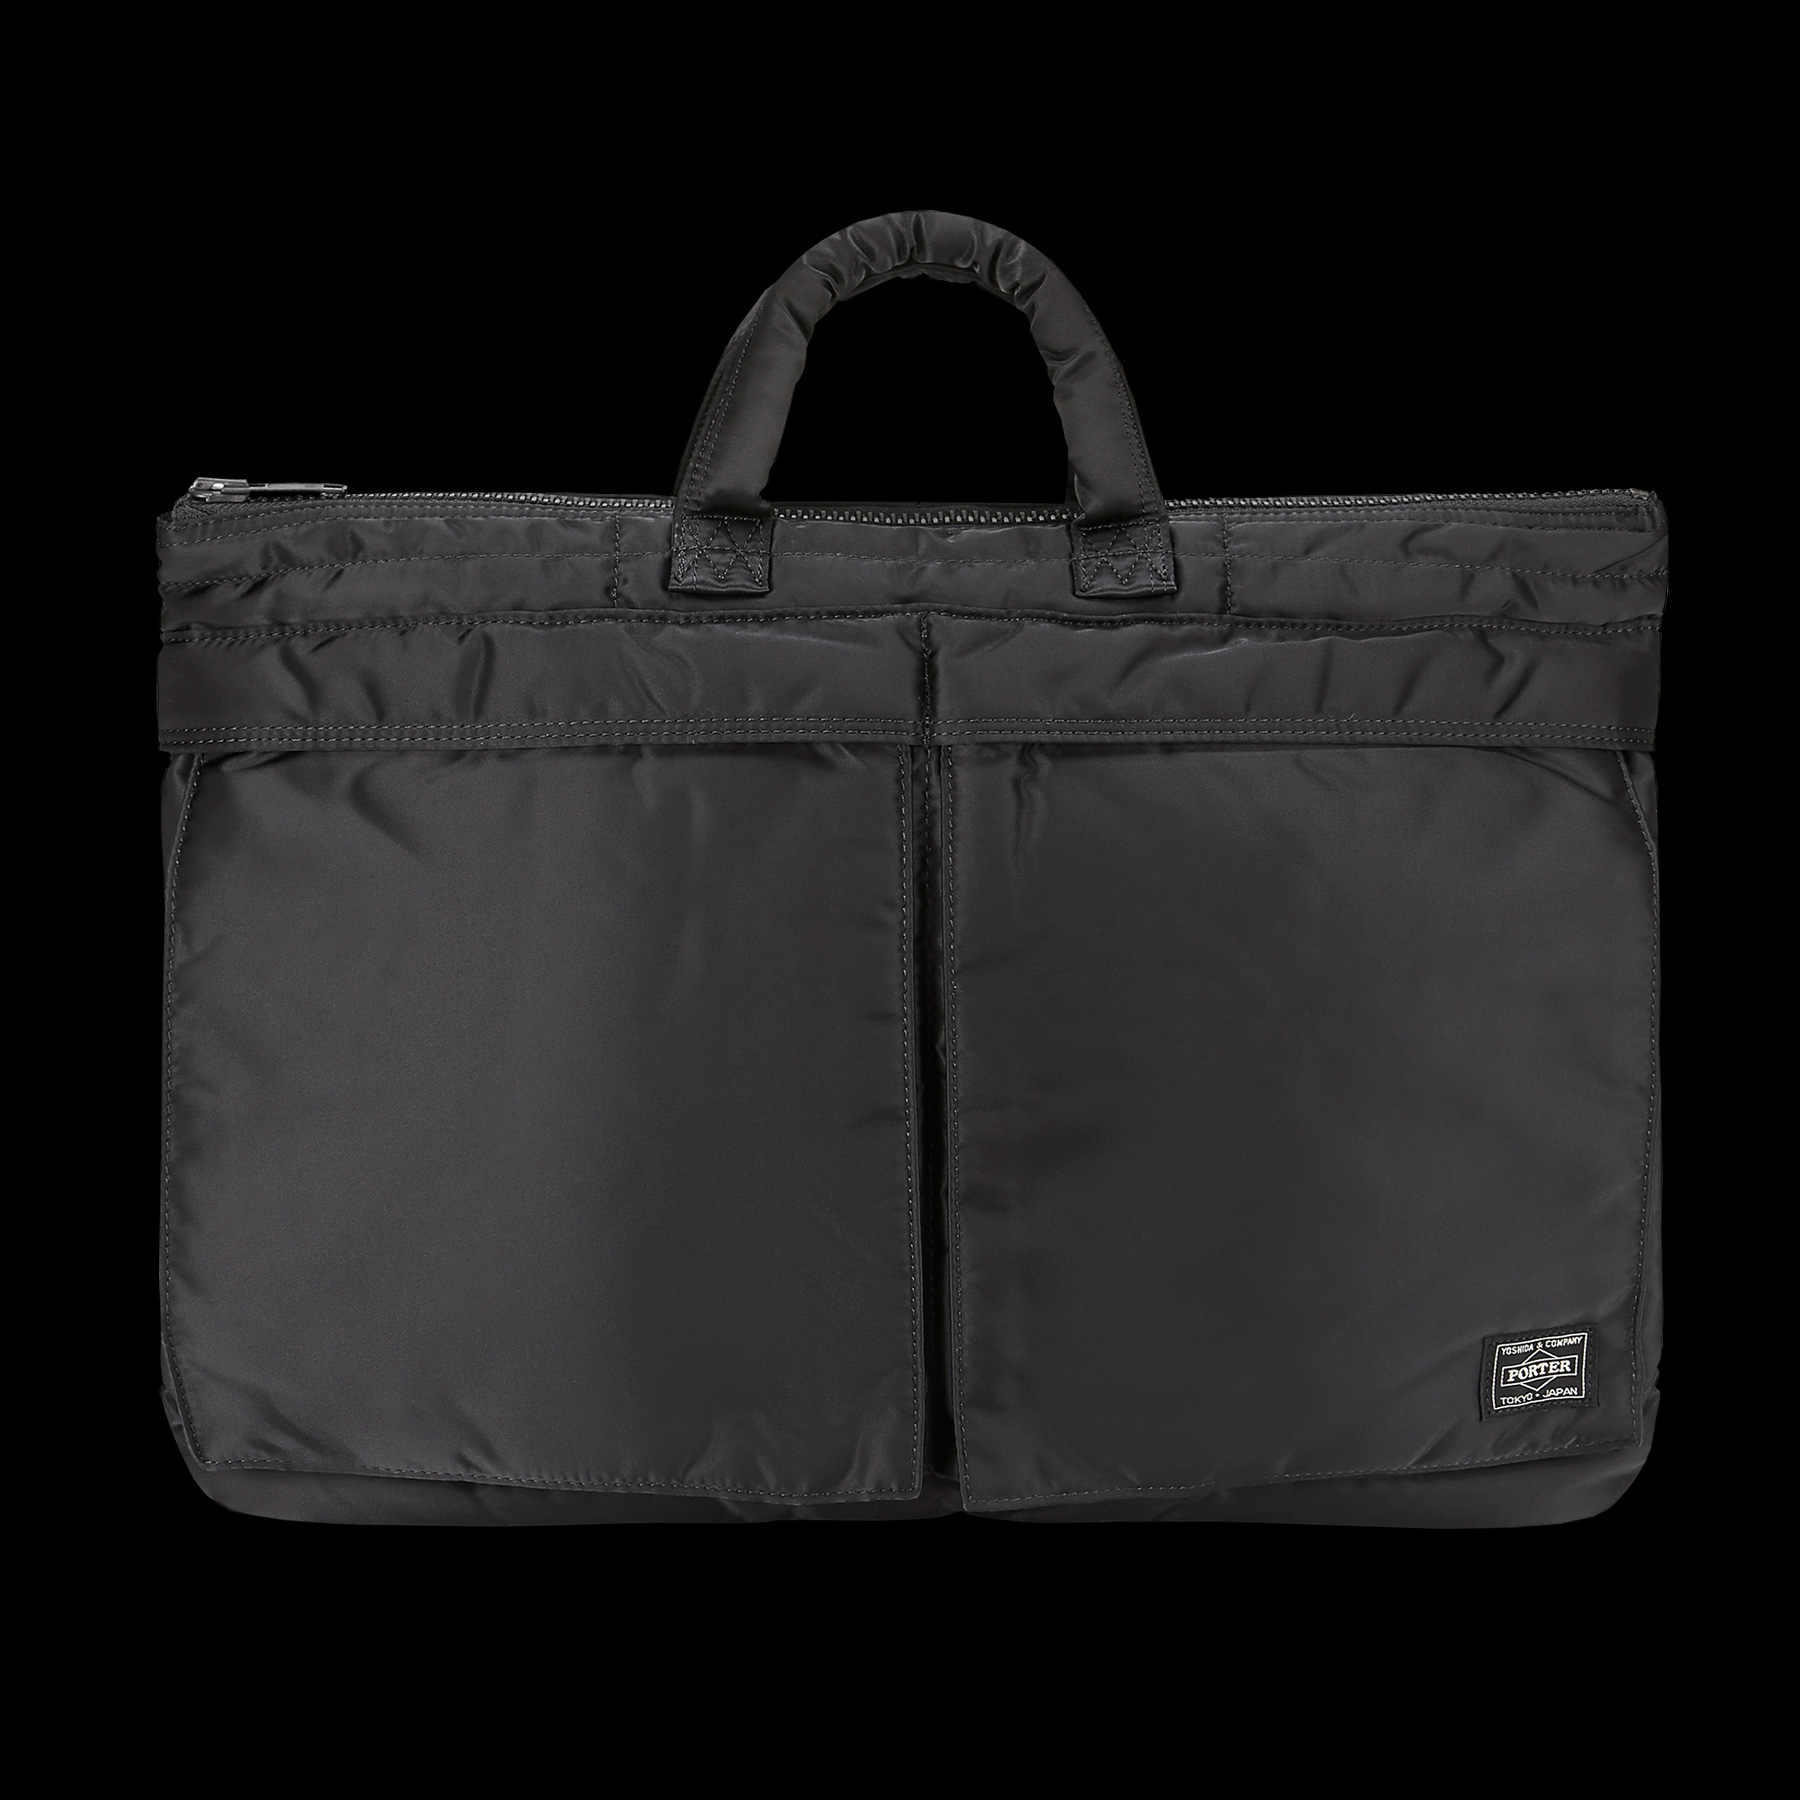 CDG_SMALL PORTER BAG_OD-K203-051_BLACK_F.jpg